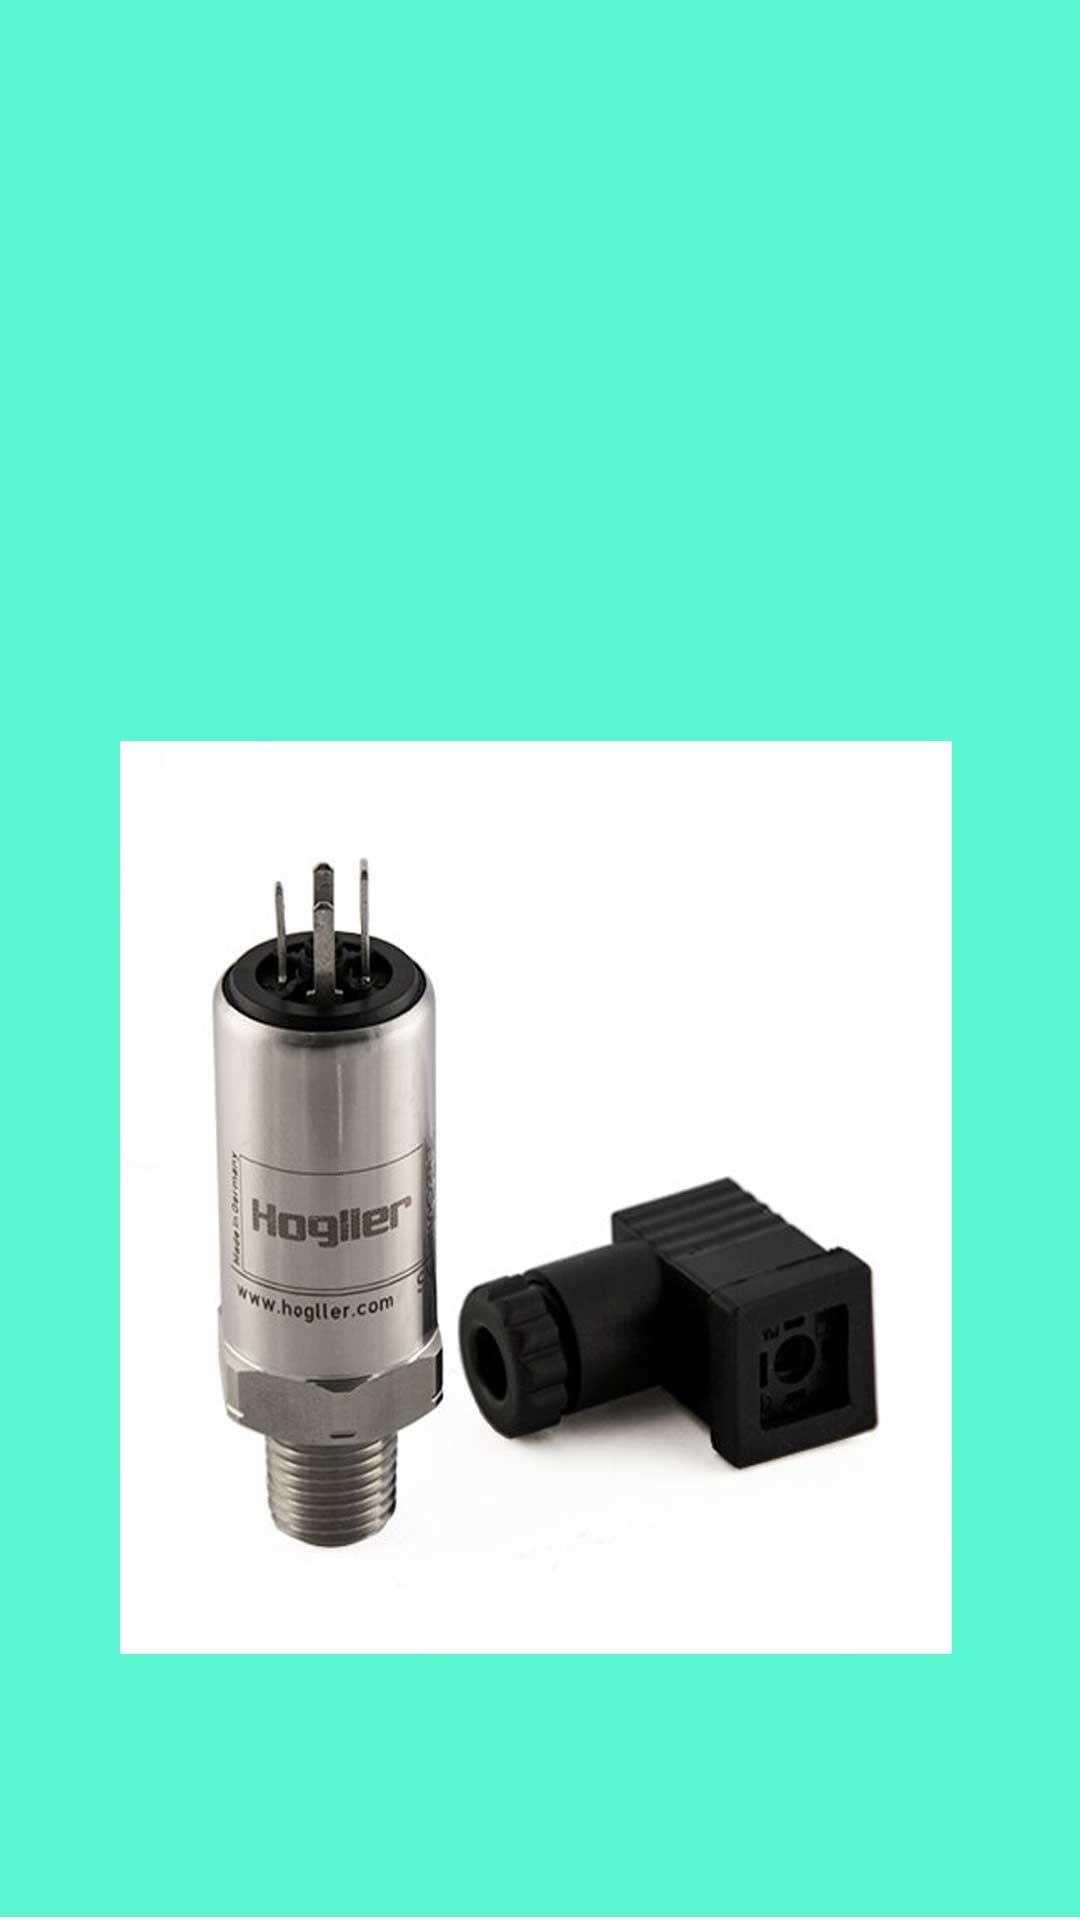 Hogller Pressure Transmitter High Pressure Hod Series Hodh2000fmck Transmitter High Pressure Conductive Materials